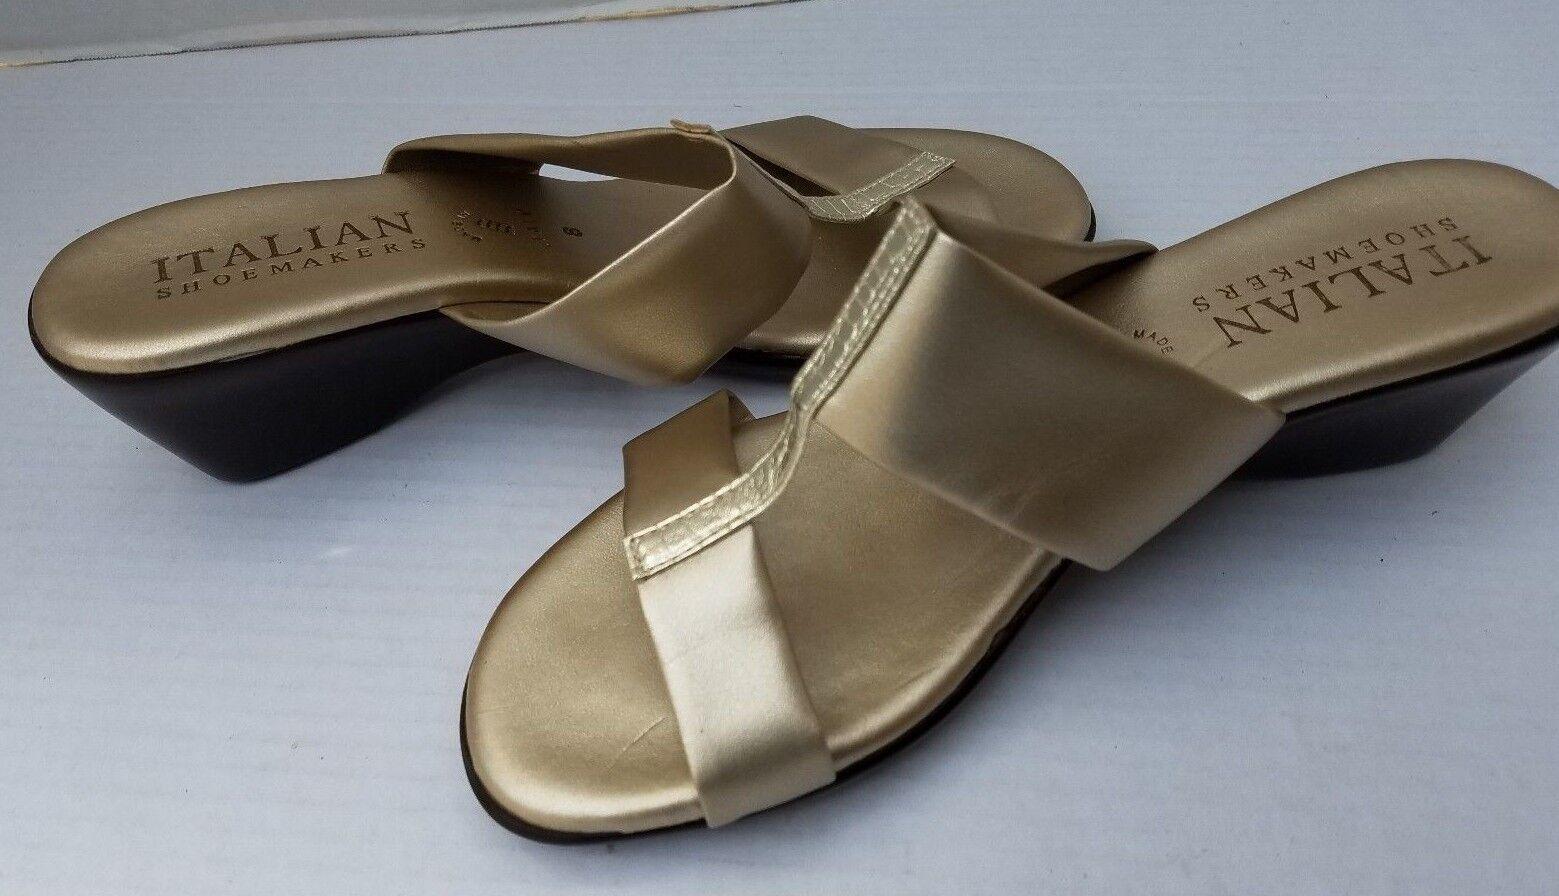 New 8 ITALIAN SHOEMAKER Gold Made in  Sandales Wedge 8 New Evening Day Slip On 389e5c